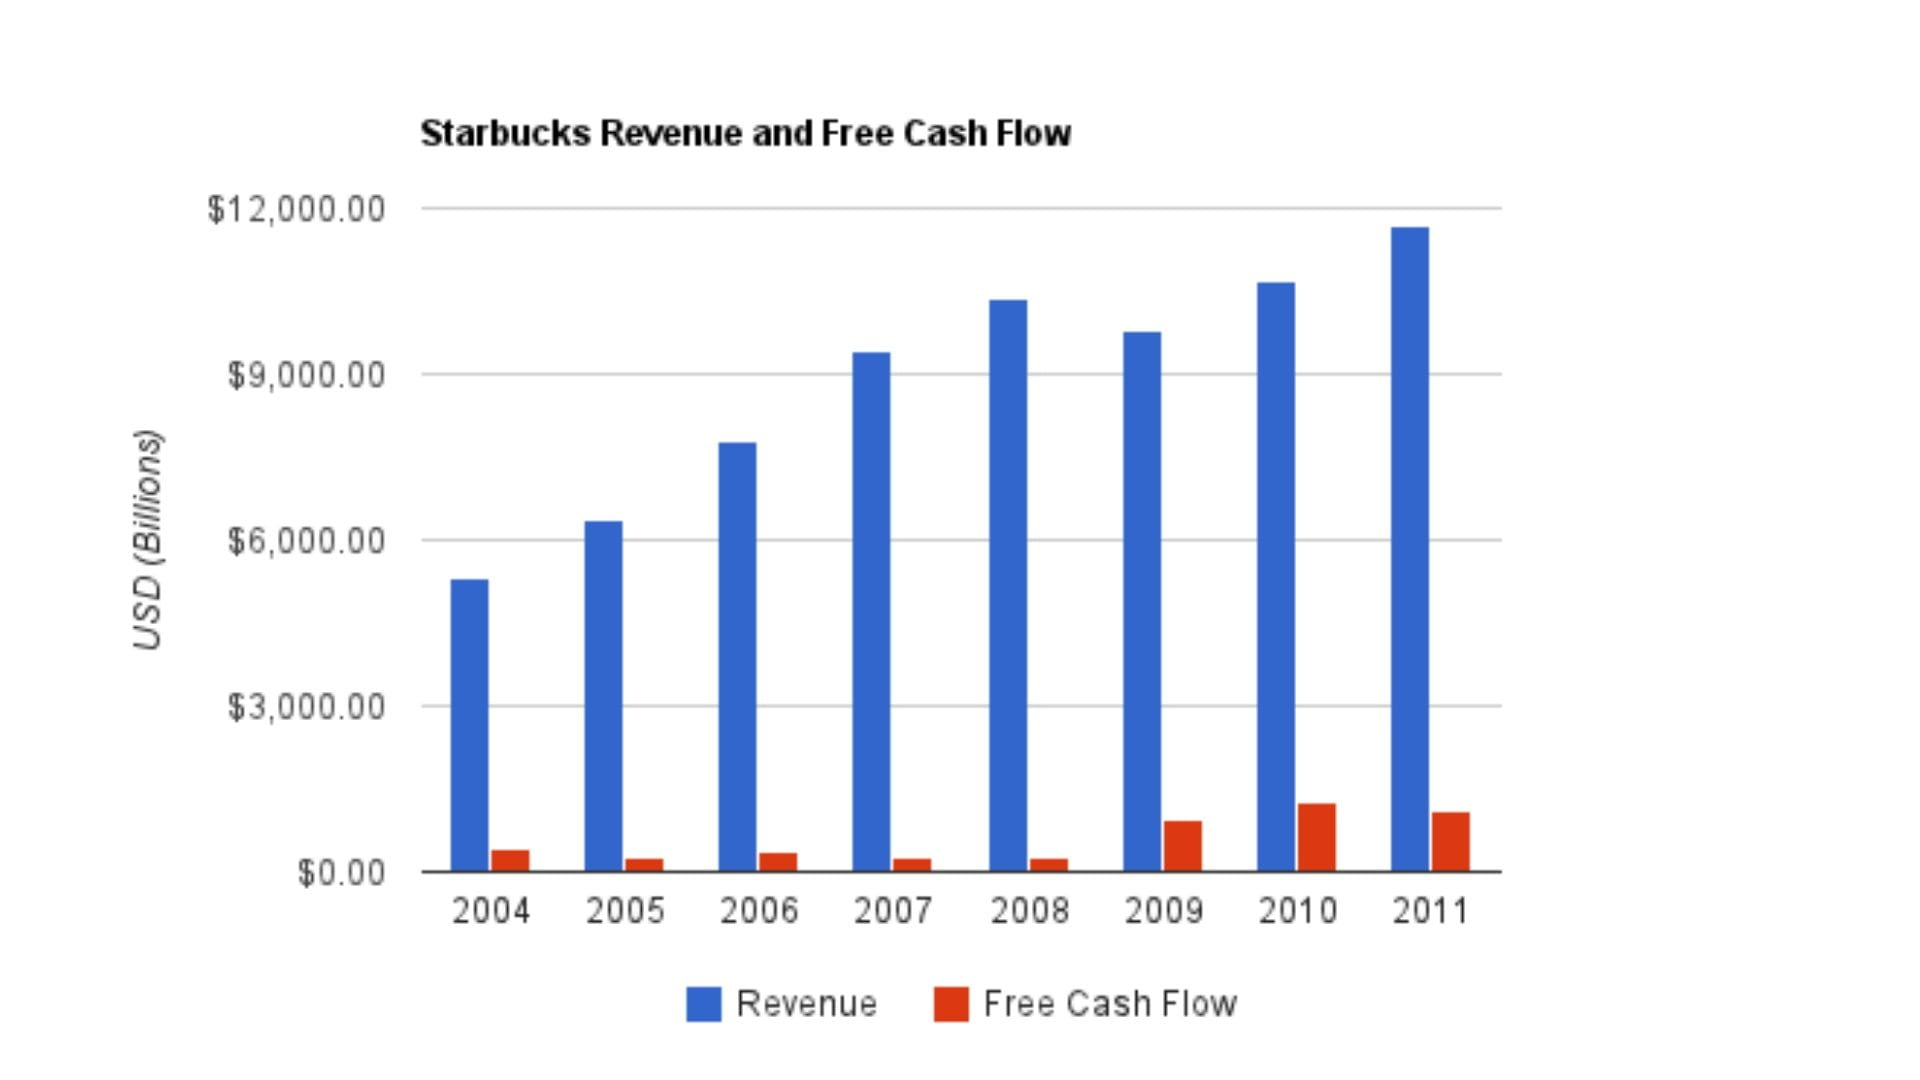 Starbucks Revenue Over The Years